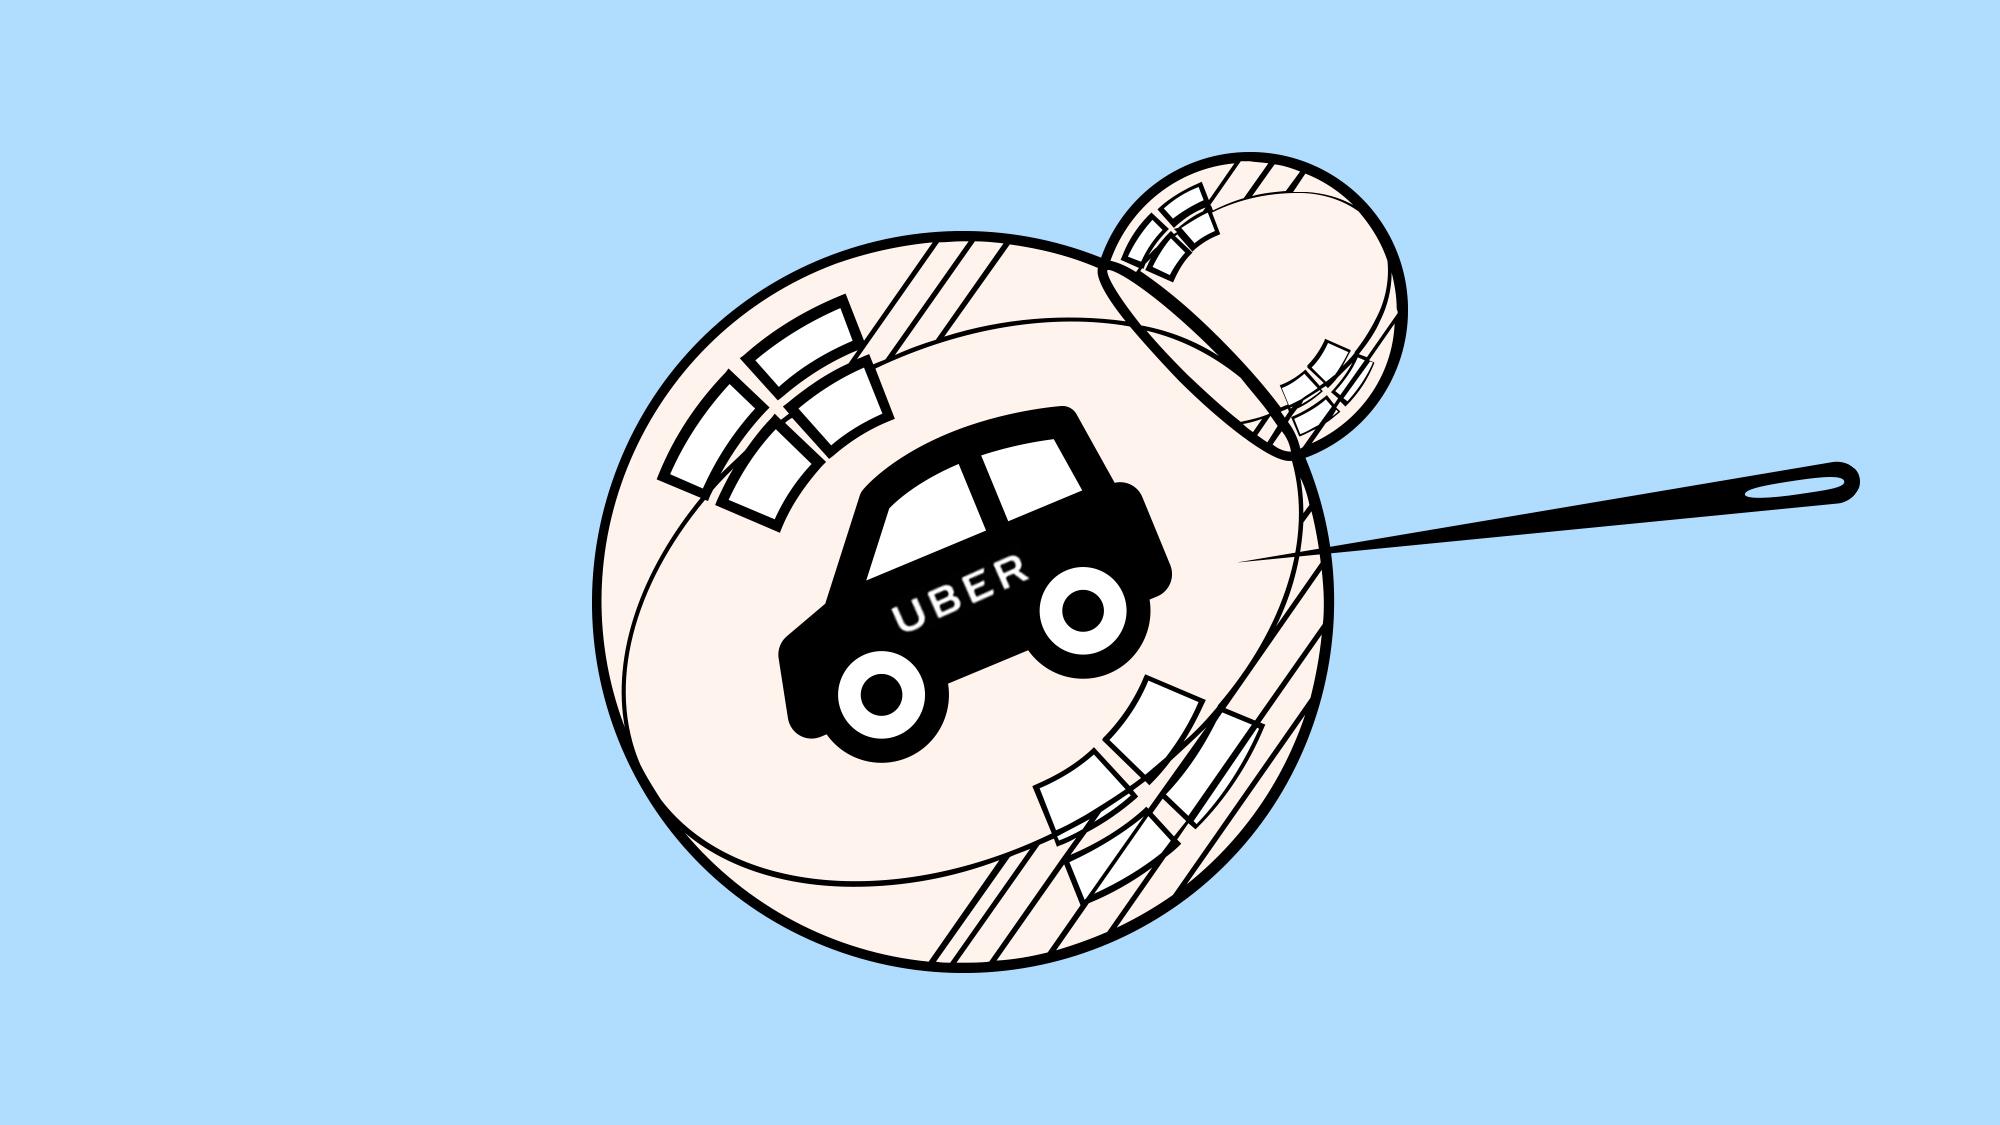 Fertig lustig: UberPop ist in Basel bald Geschichte.